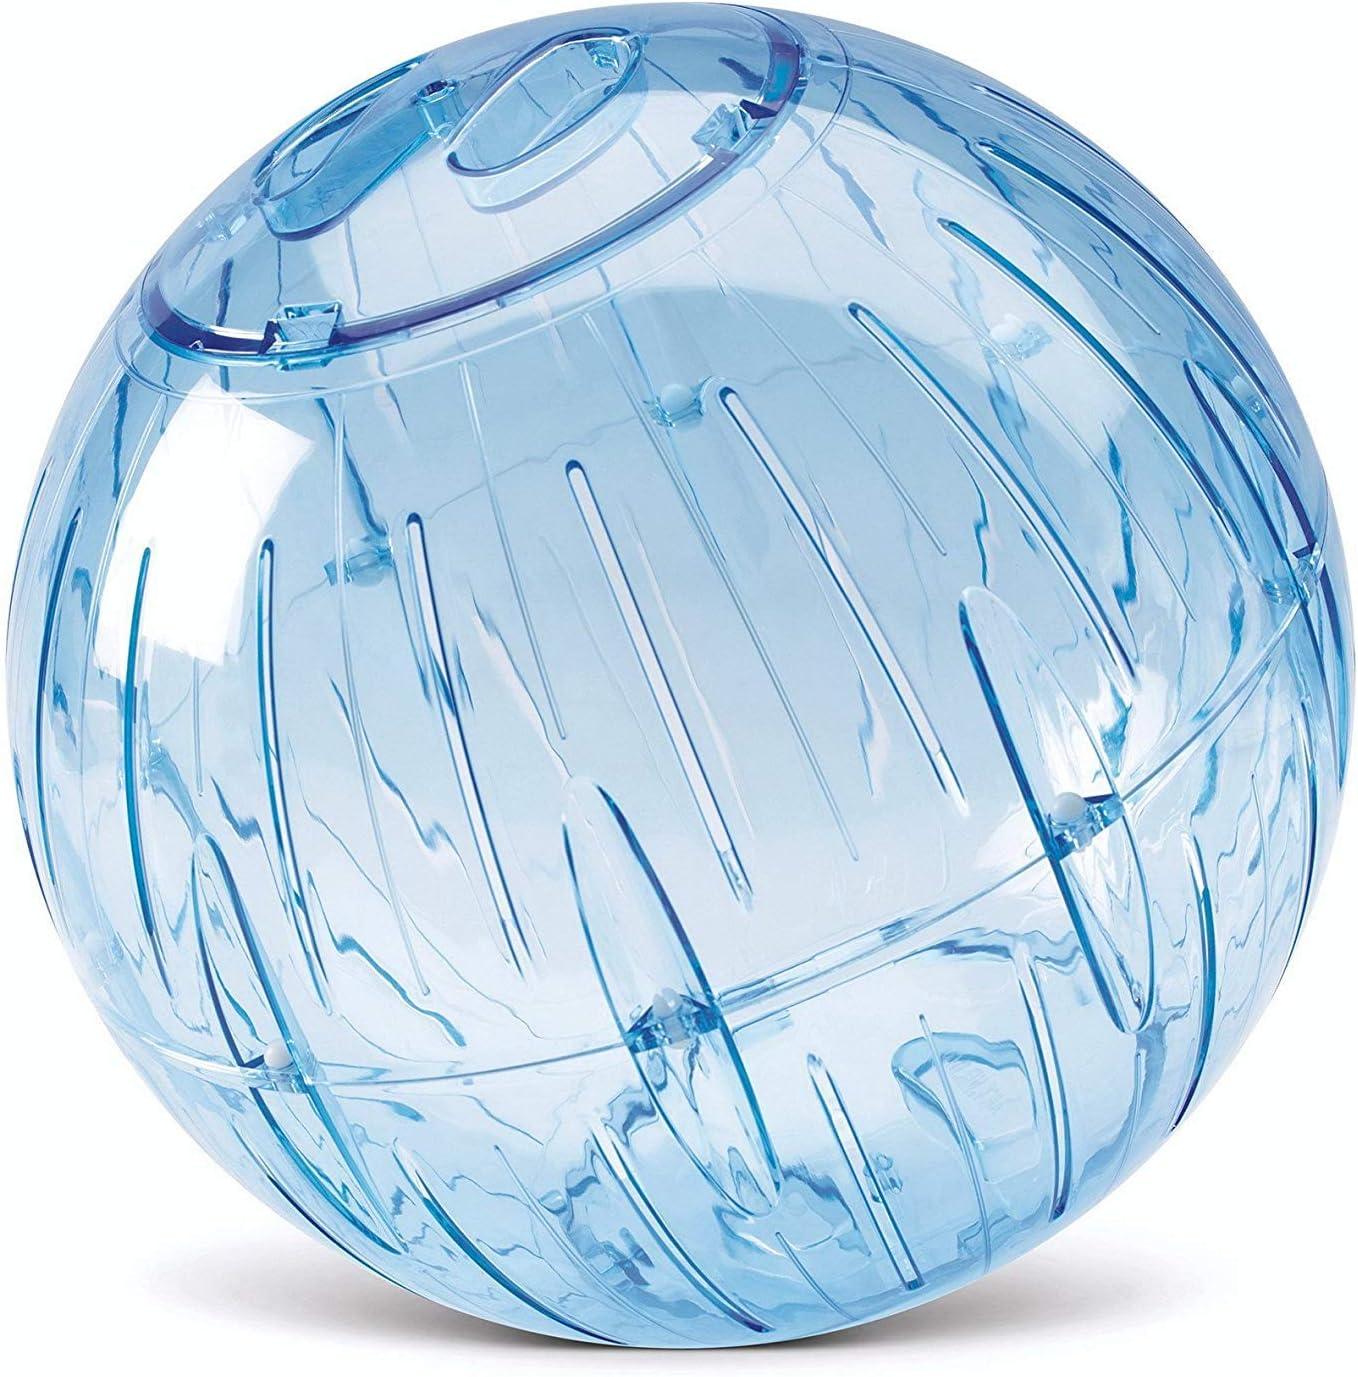 Crystal, Blue 2 Pack Ruosaren Hamster Run Exercise Ball 5.7 inch